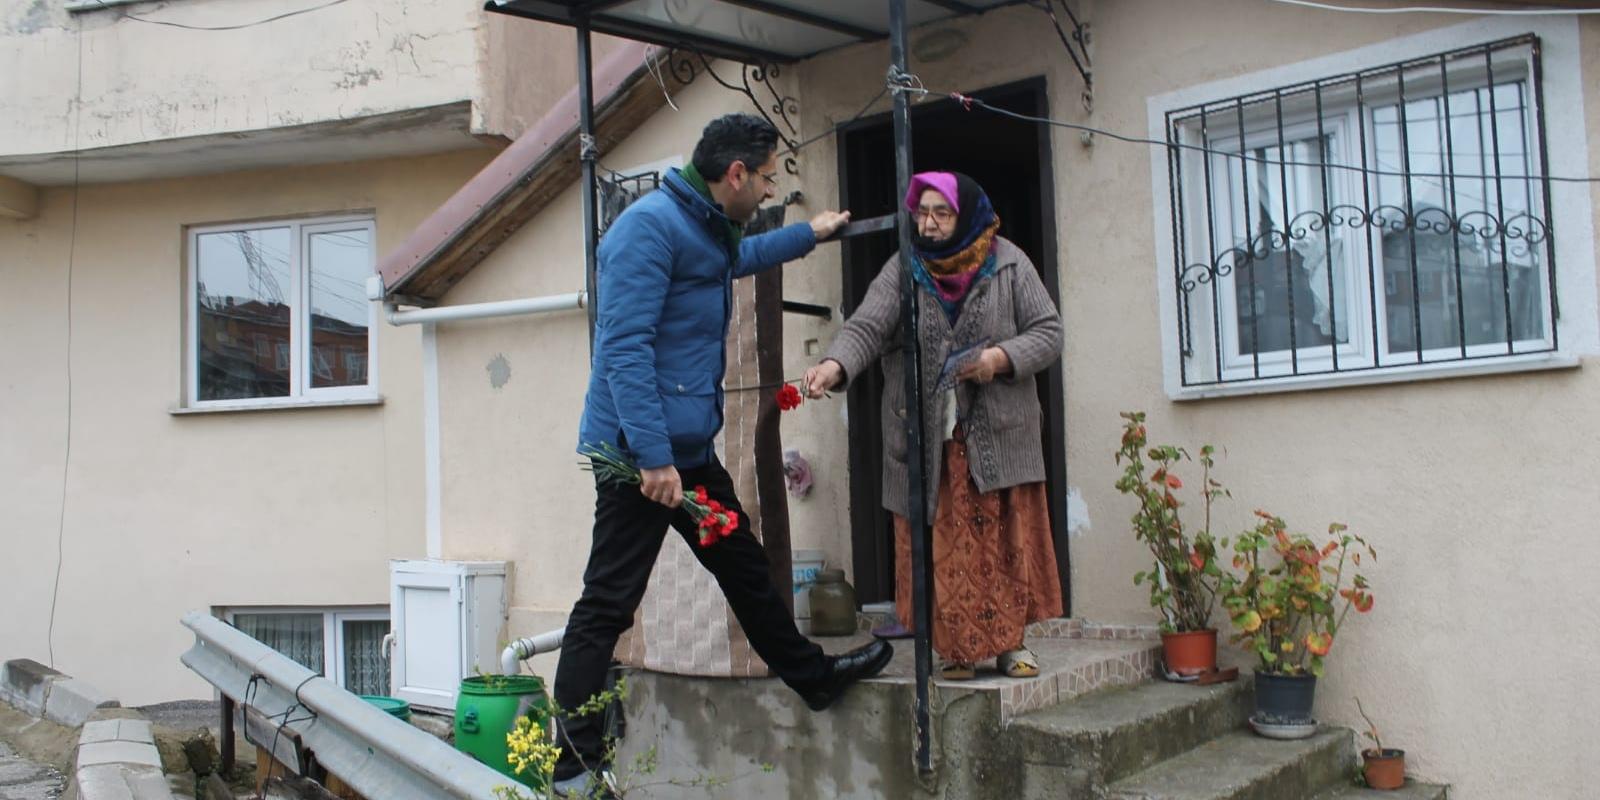 Kaşıtoğlu, Soğuksu Halkına Karanfil Uzattı